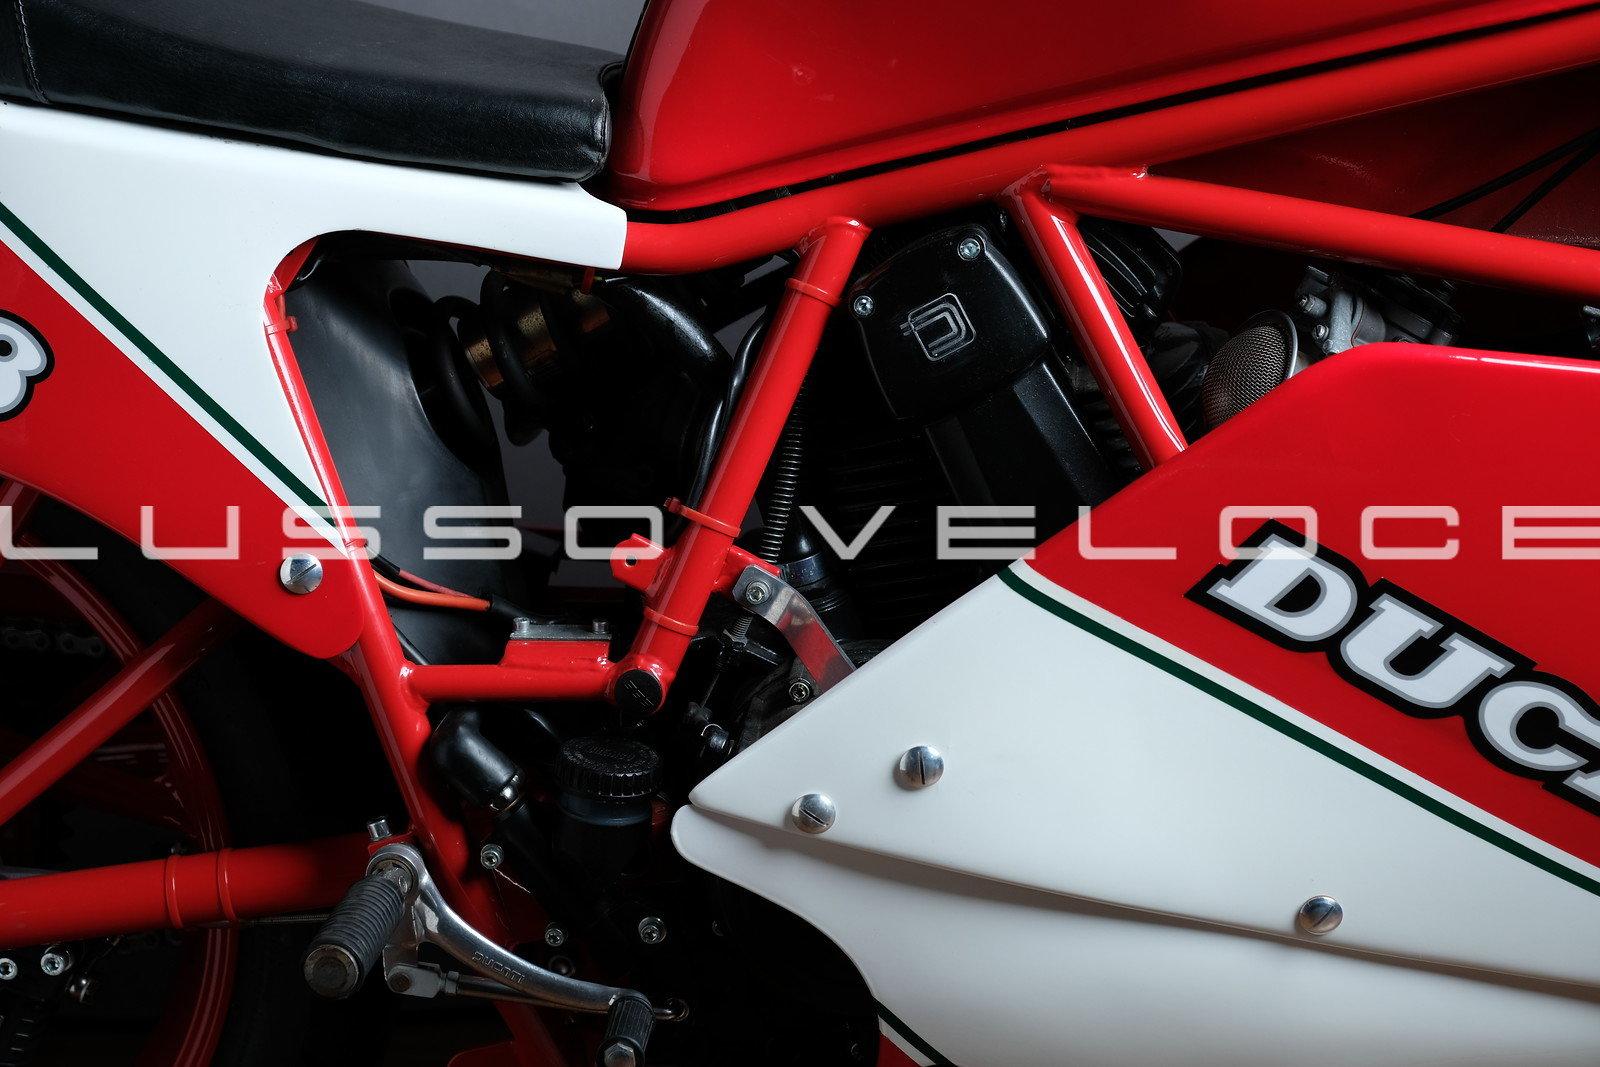 1986 Rare Ducati F3 350 fully restored For Sale (picture 4 of 15)